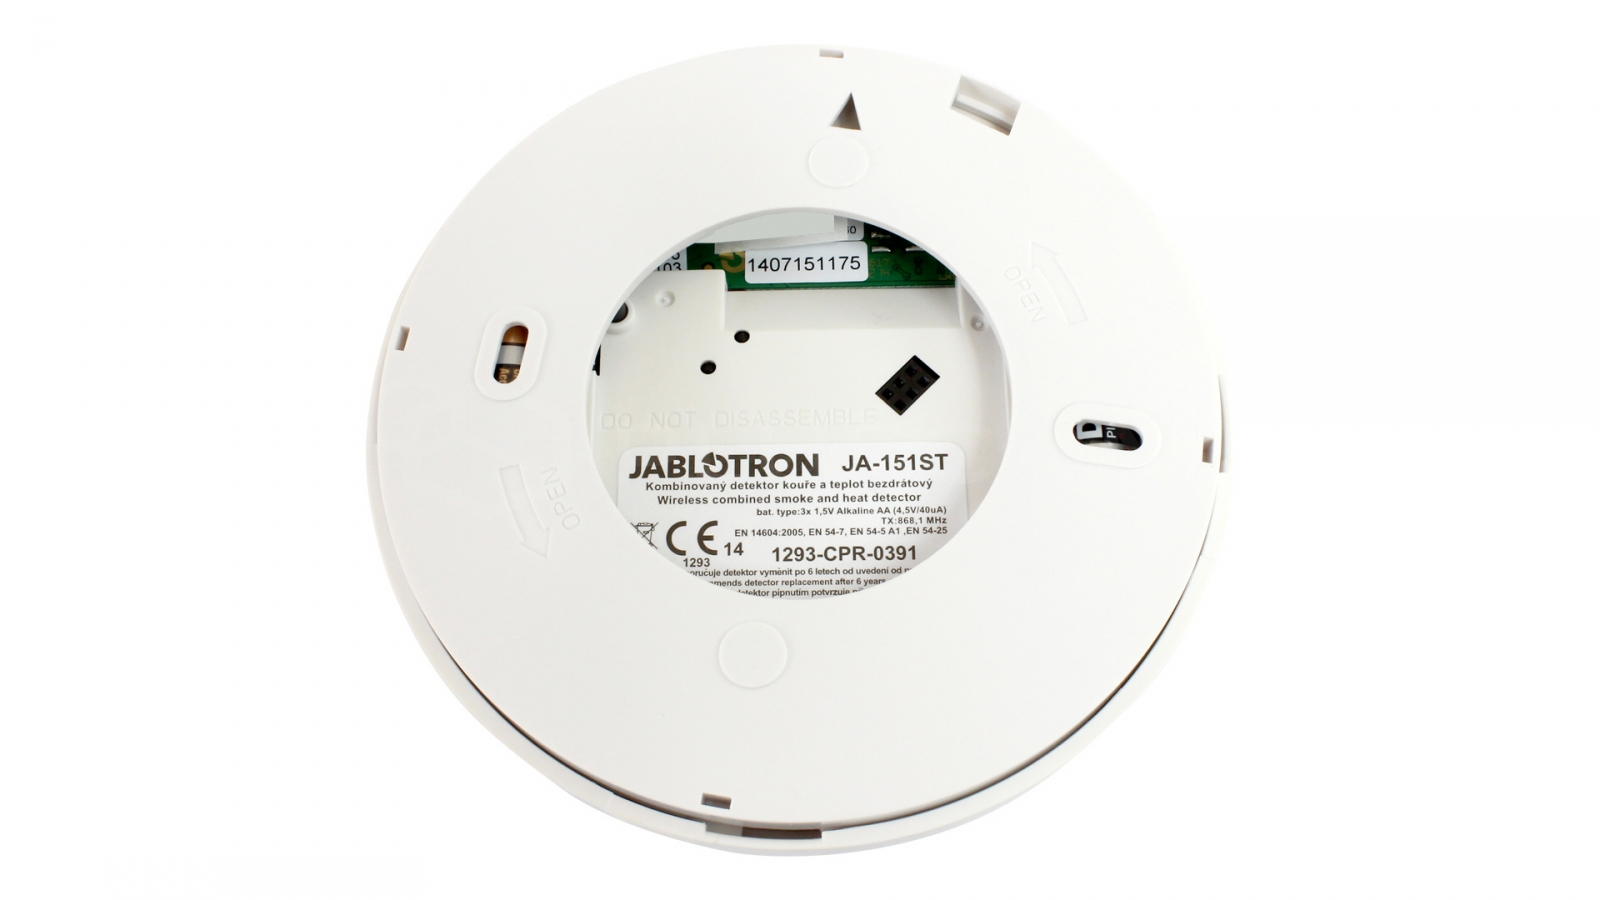 jablotron ja 151st wireless optical smoke and heat detector. Black Bedroom Furniture Sets. Home Design Ideas